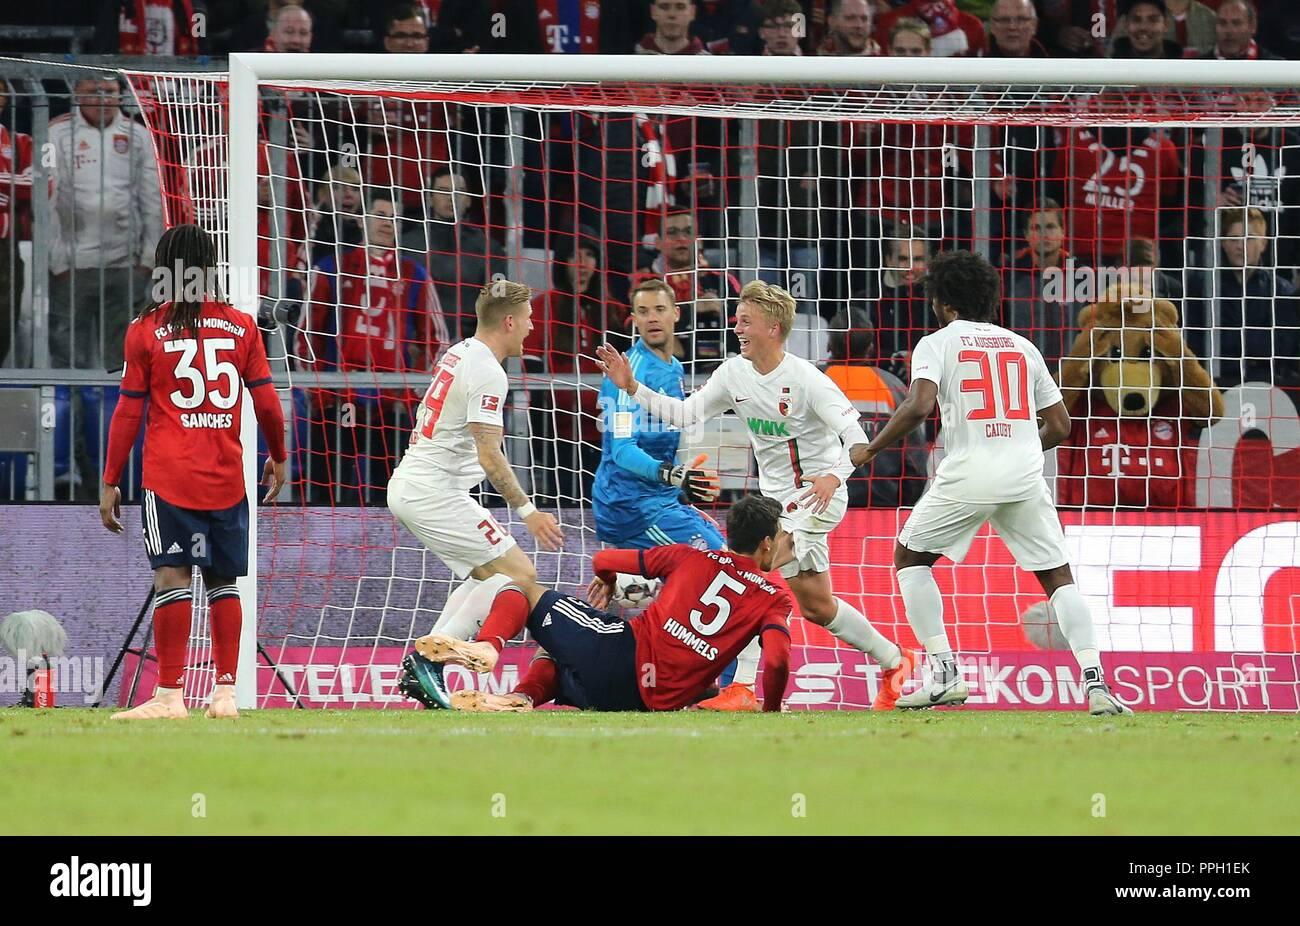 firo: 25.09.2018 Fuvuball, Football: 1.Bundesliga FC Bayern Munich - FC Augsburg, Felix GVtze, Augsburg, jubilation, | usage worldwide Stock Photo